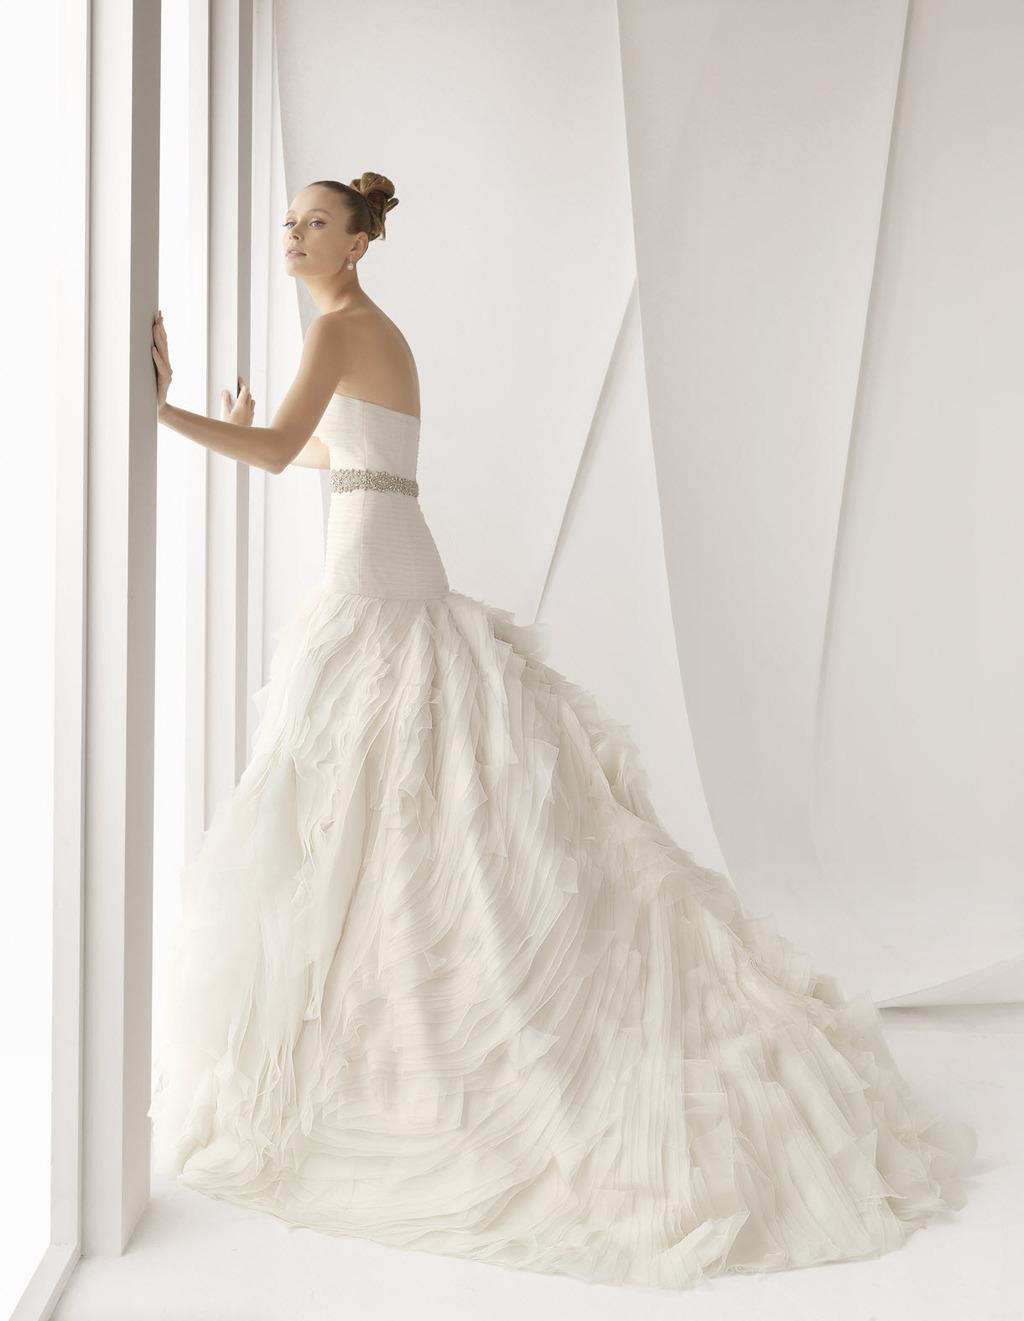 Alcauntara-spring-2012-wedding-dress-rosa-clara-bridal-gowns-strapless-ballgown-bridal-belt.full